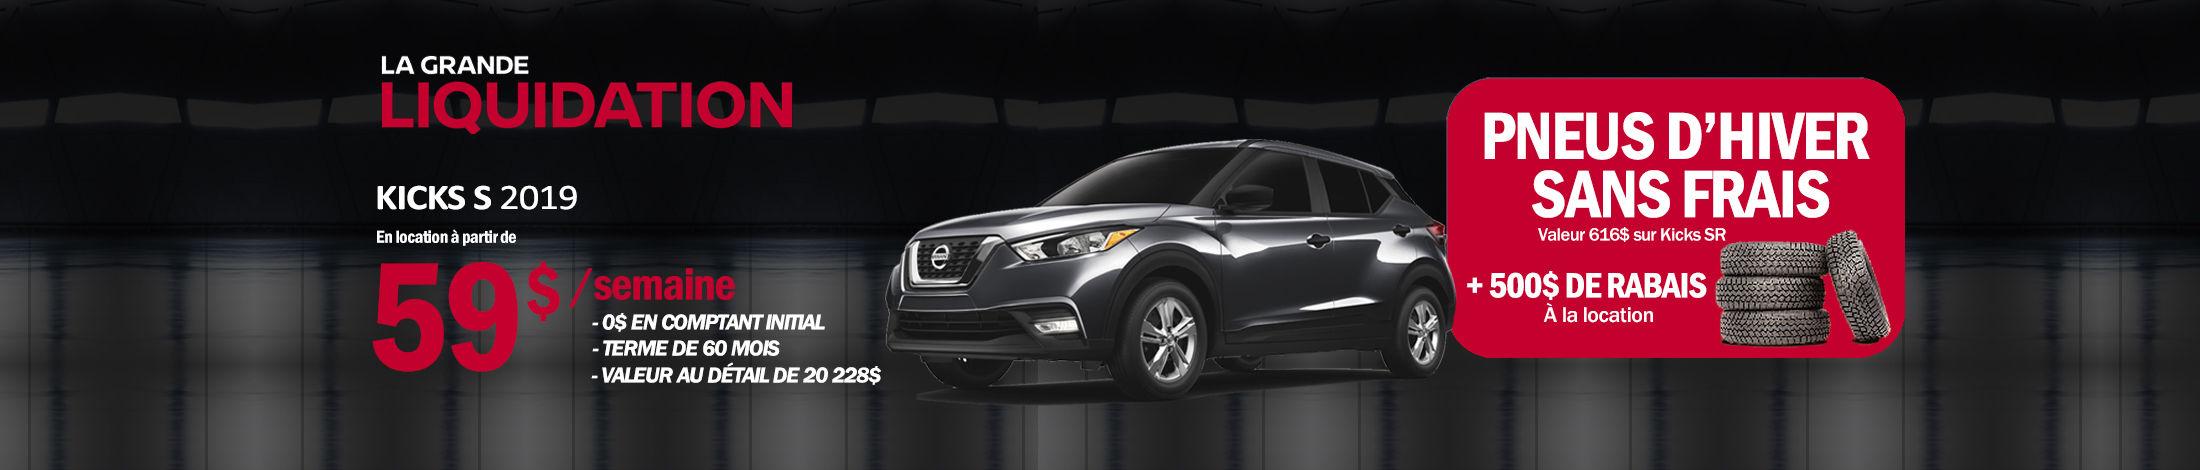 Nissan Kicks promotion banner